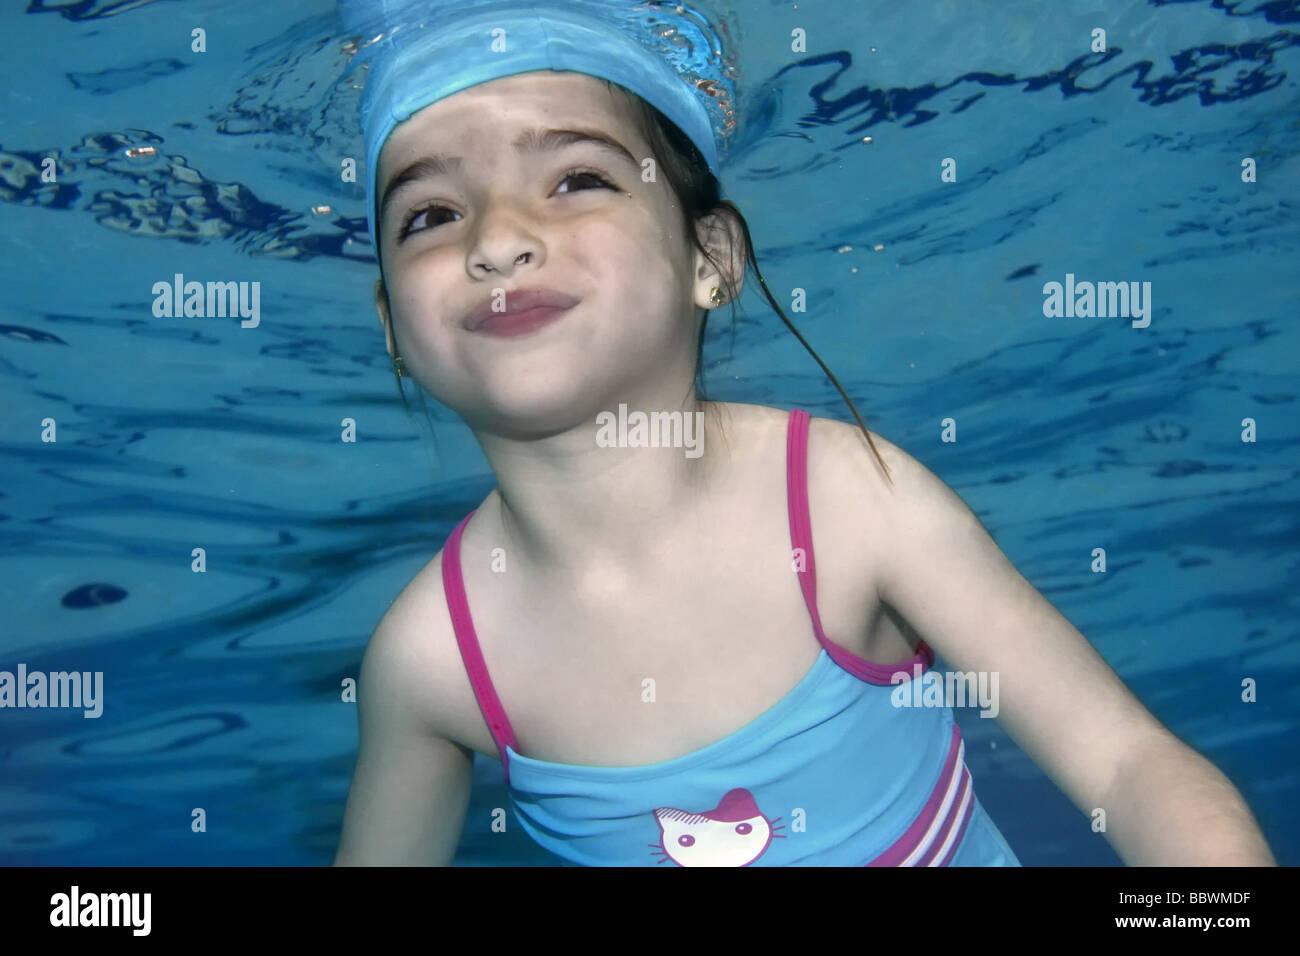 swimming cap woman funny stock photos & swimming cap woman funny